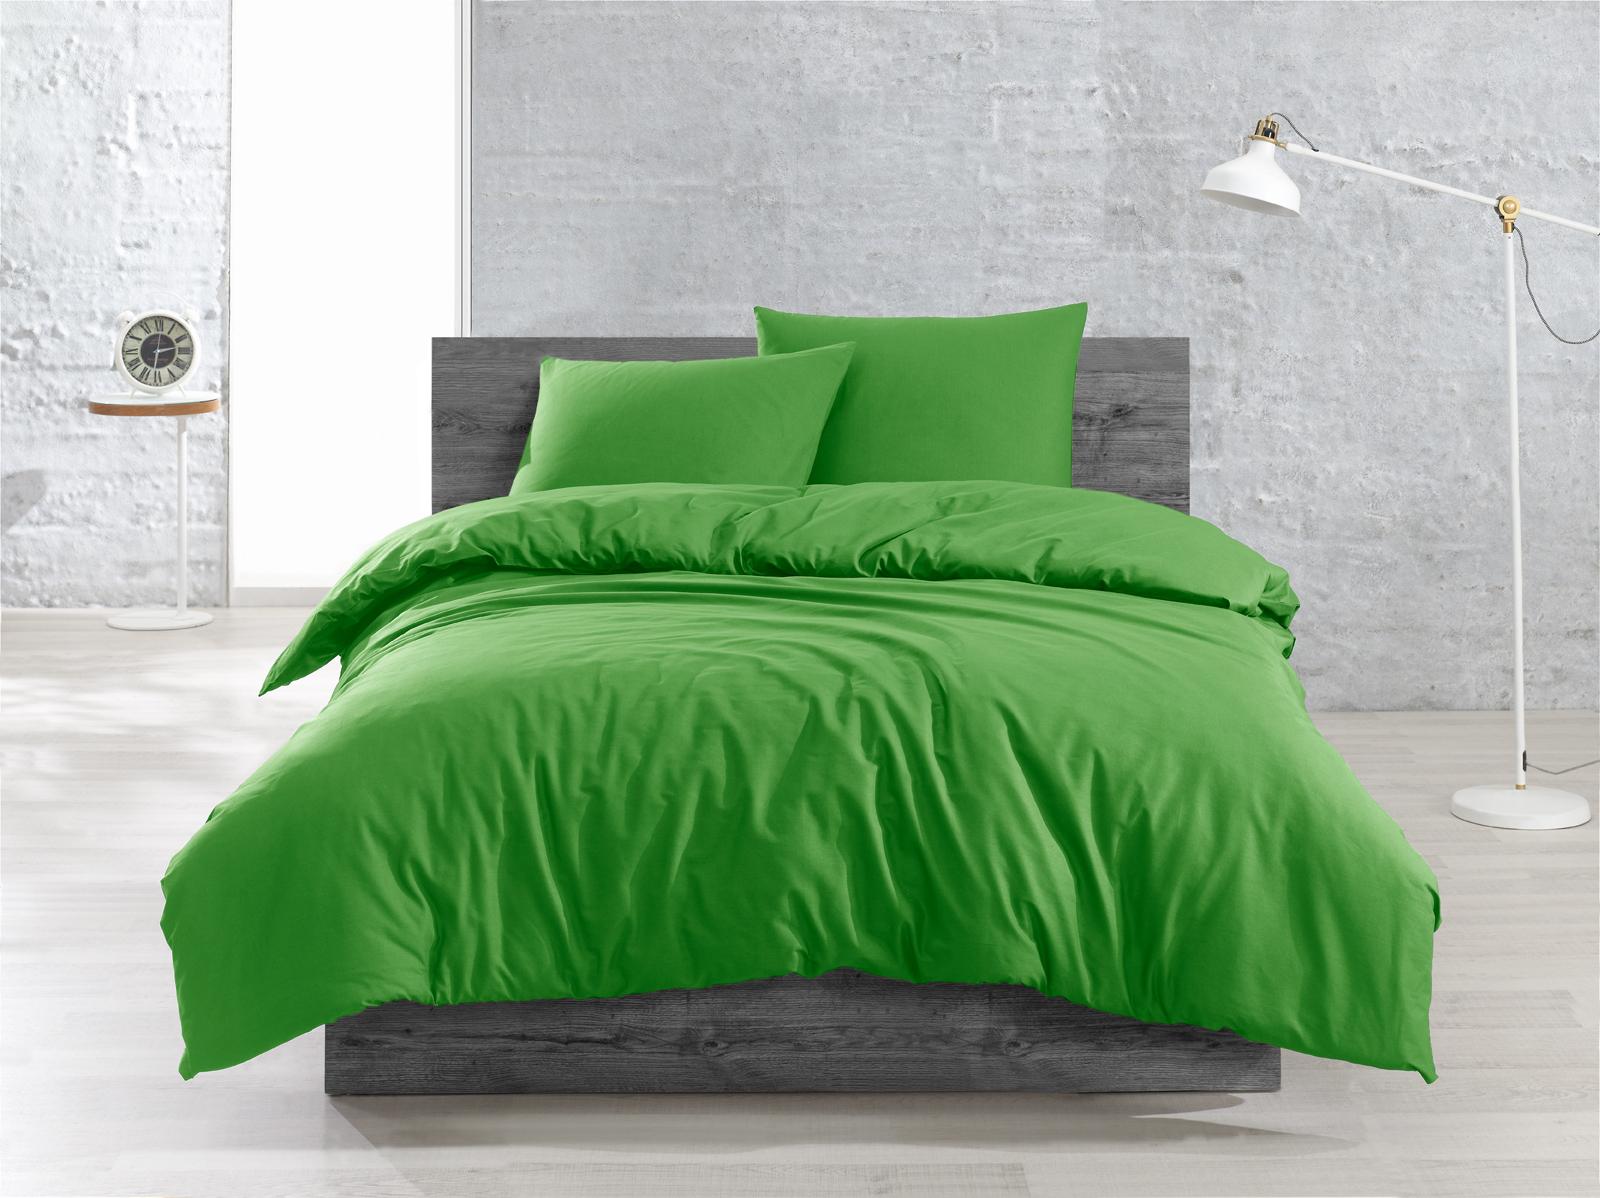 3 tlg renforce bettw sche bettgarnitur 200x200 cm i 200x220 cm uni farben ebay. Black Bedroom Furniture Sets. Home Design Ideas